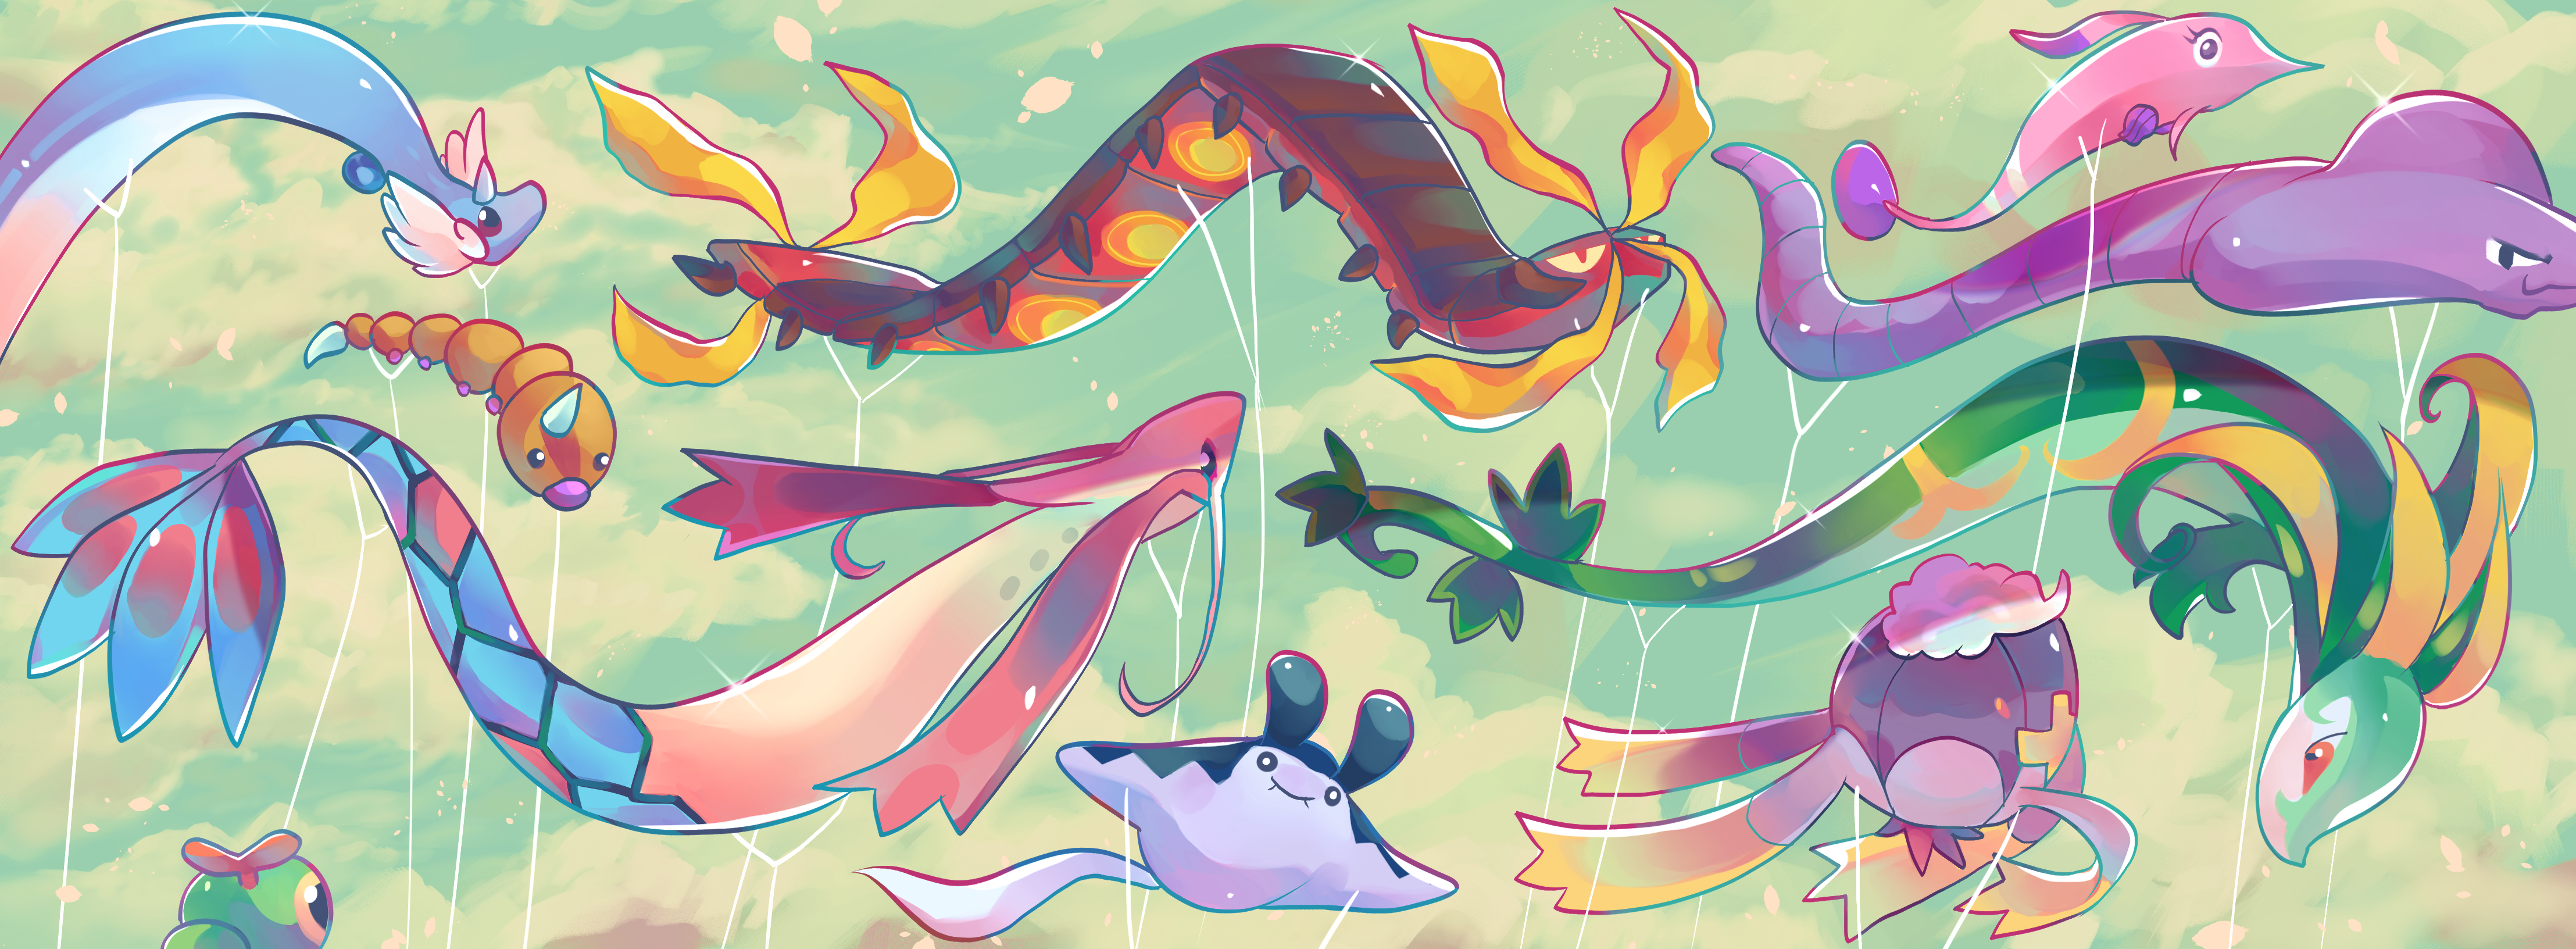 Pokemon Balloon Festival by puppsicle on DeviantArt